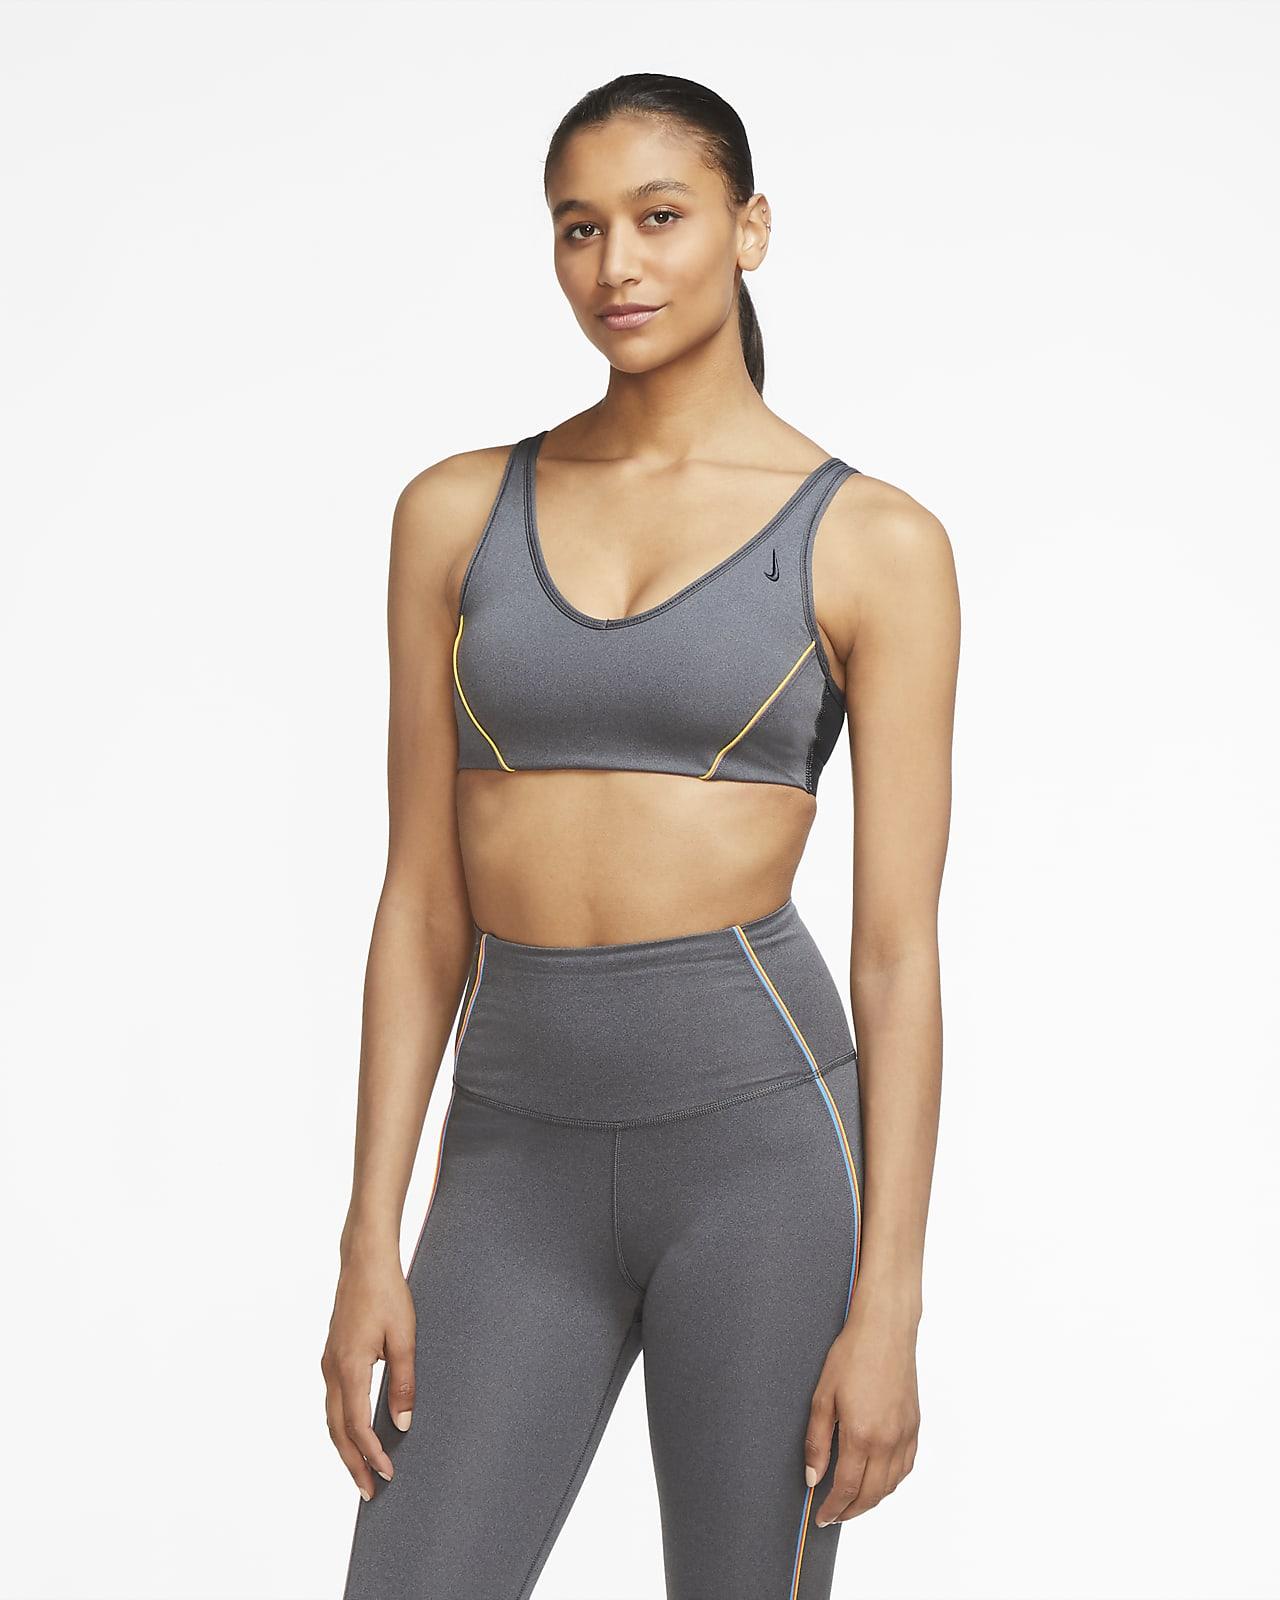 Nike Favourites Women's Light-Support Sports Bra